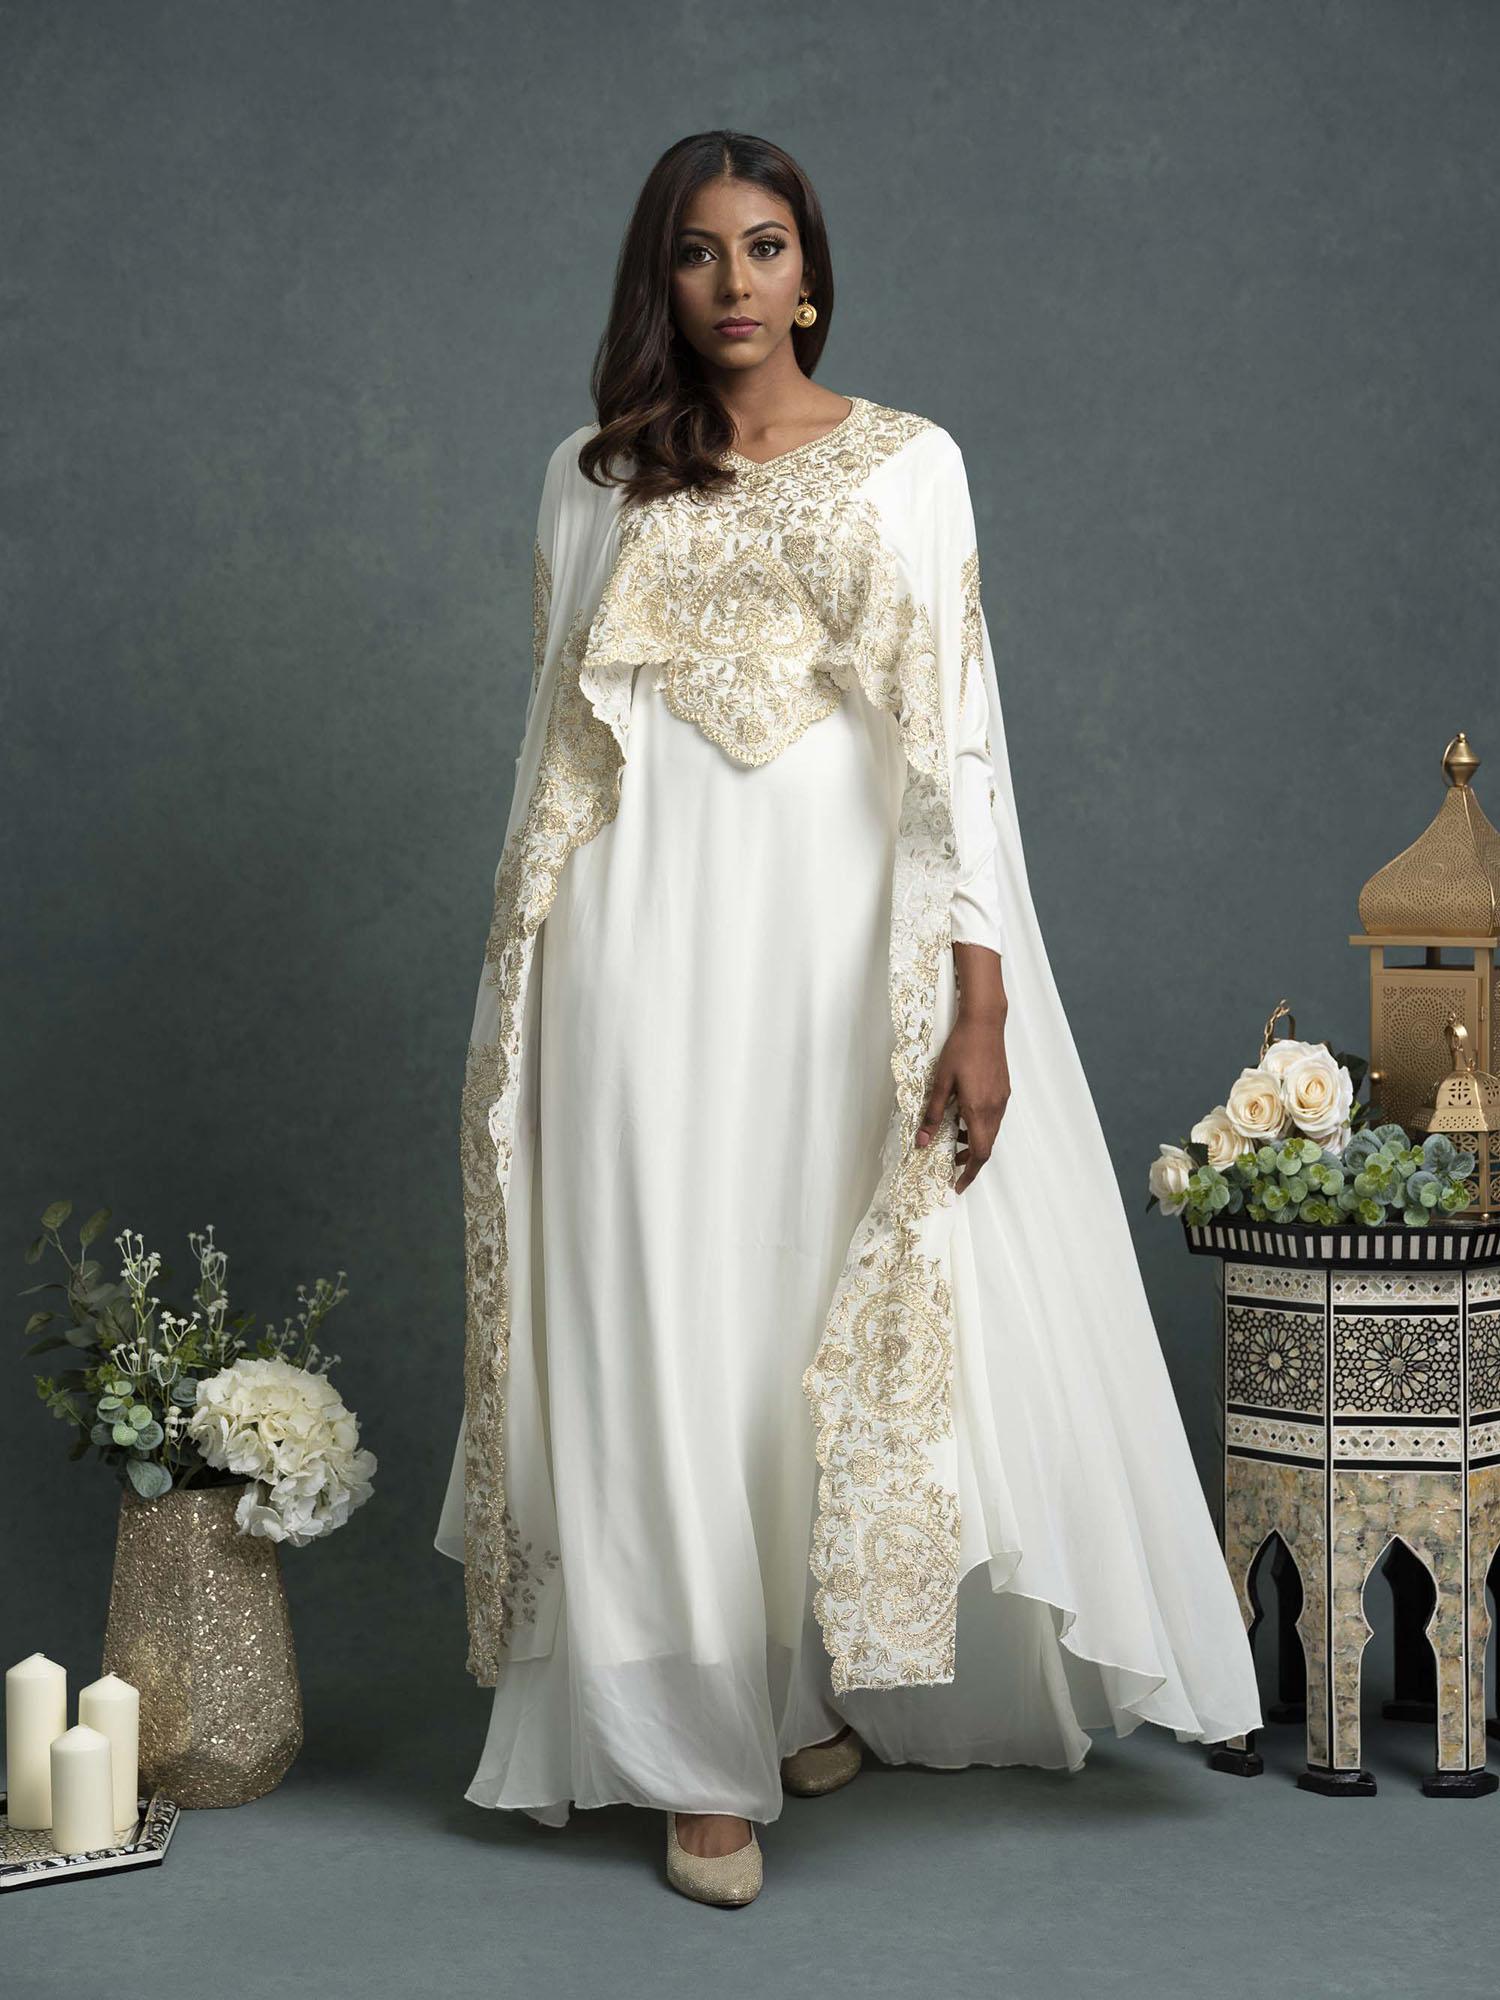 Fashion Photography Maghrebi Clothing Singapore Product Photographer COCO Creative Studio 6